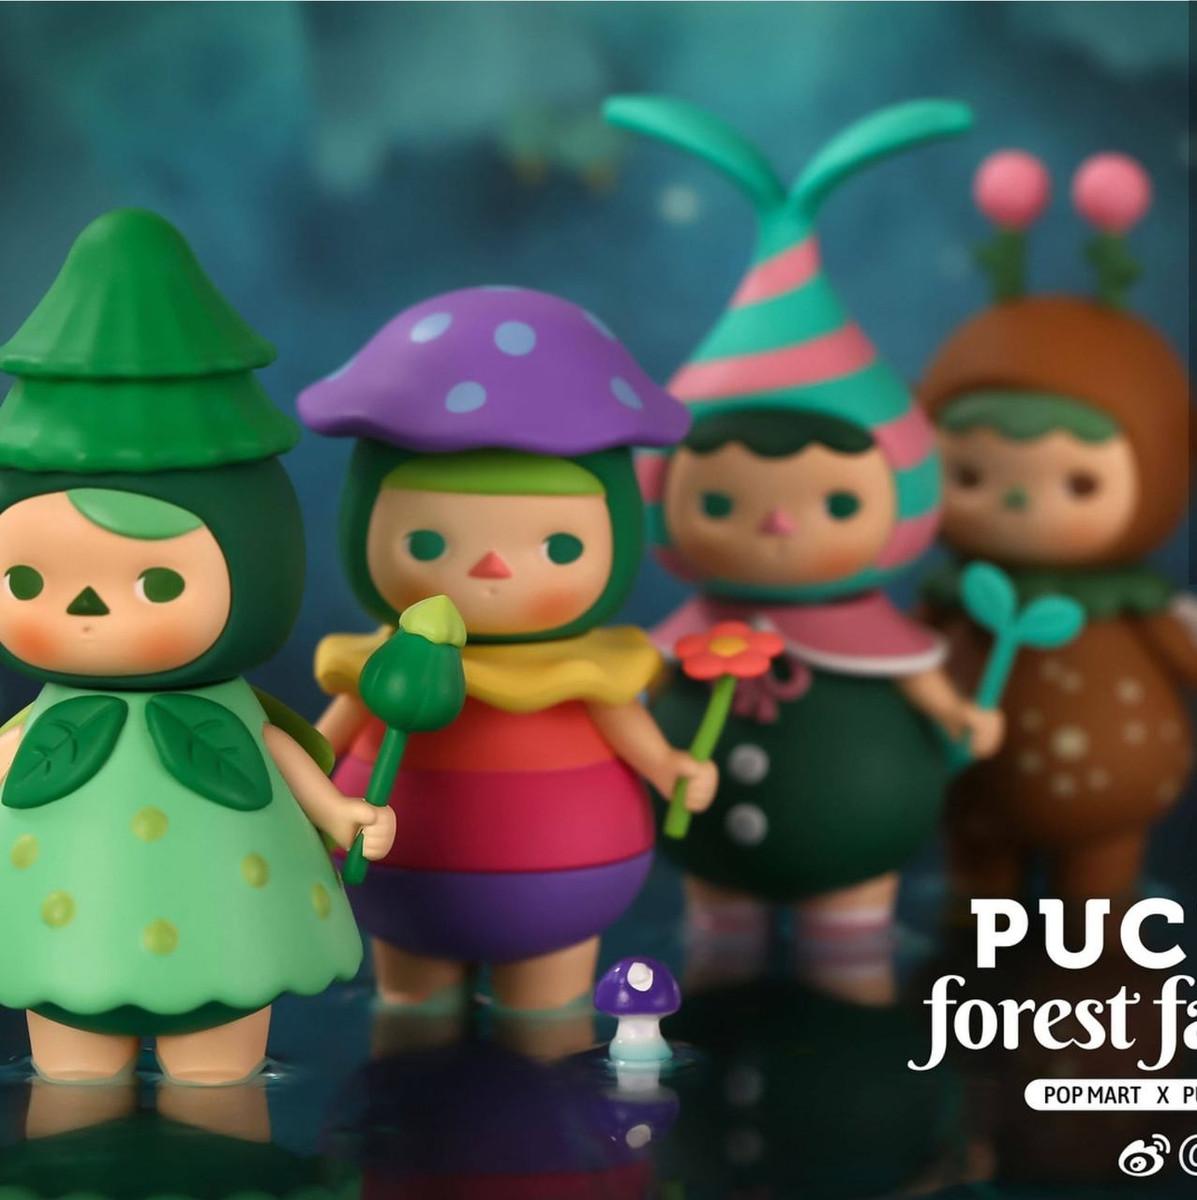 Pop Mart Pucky Forest Faries Mini Figure Cloud Fairy NEW